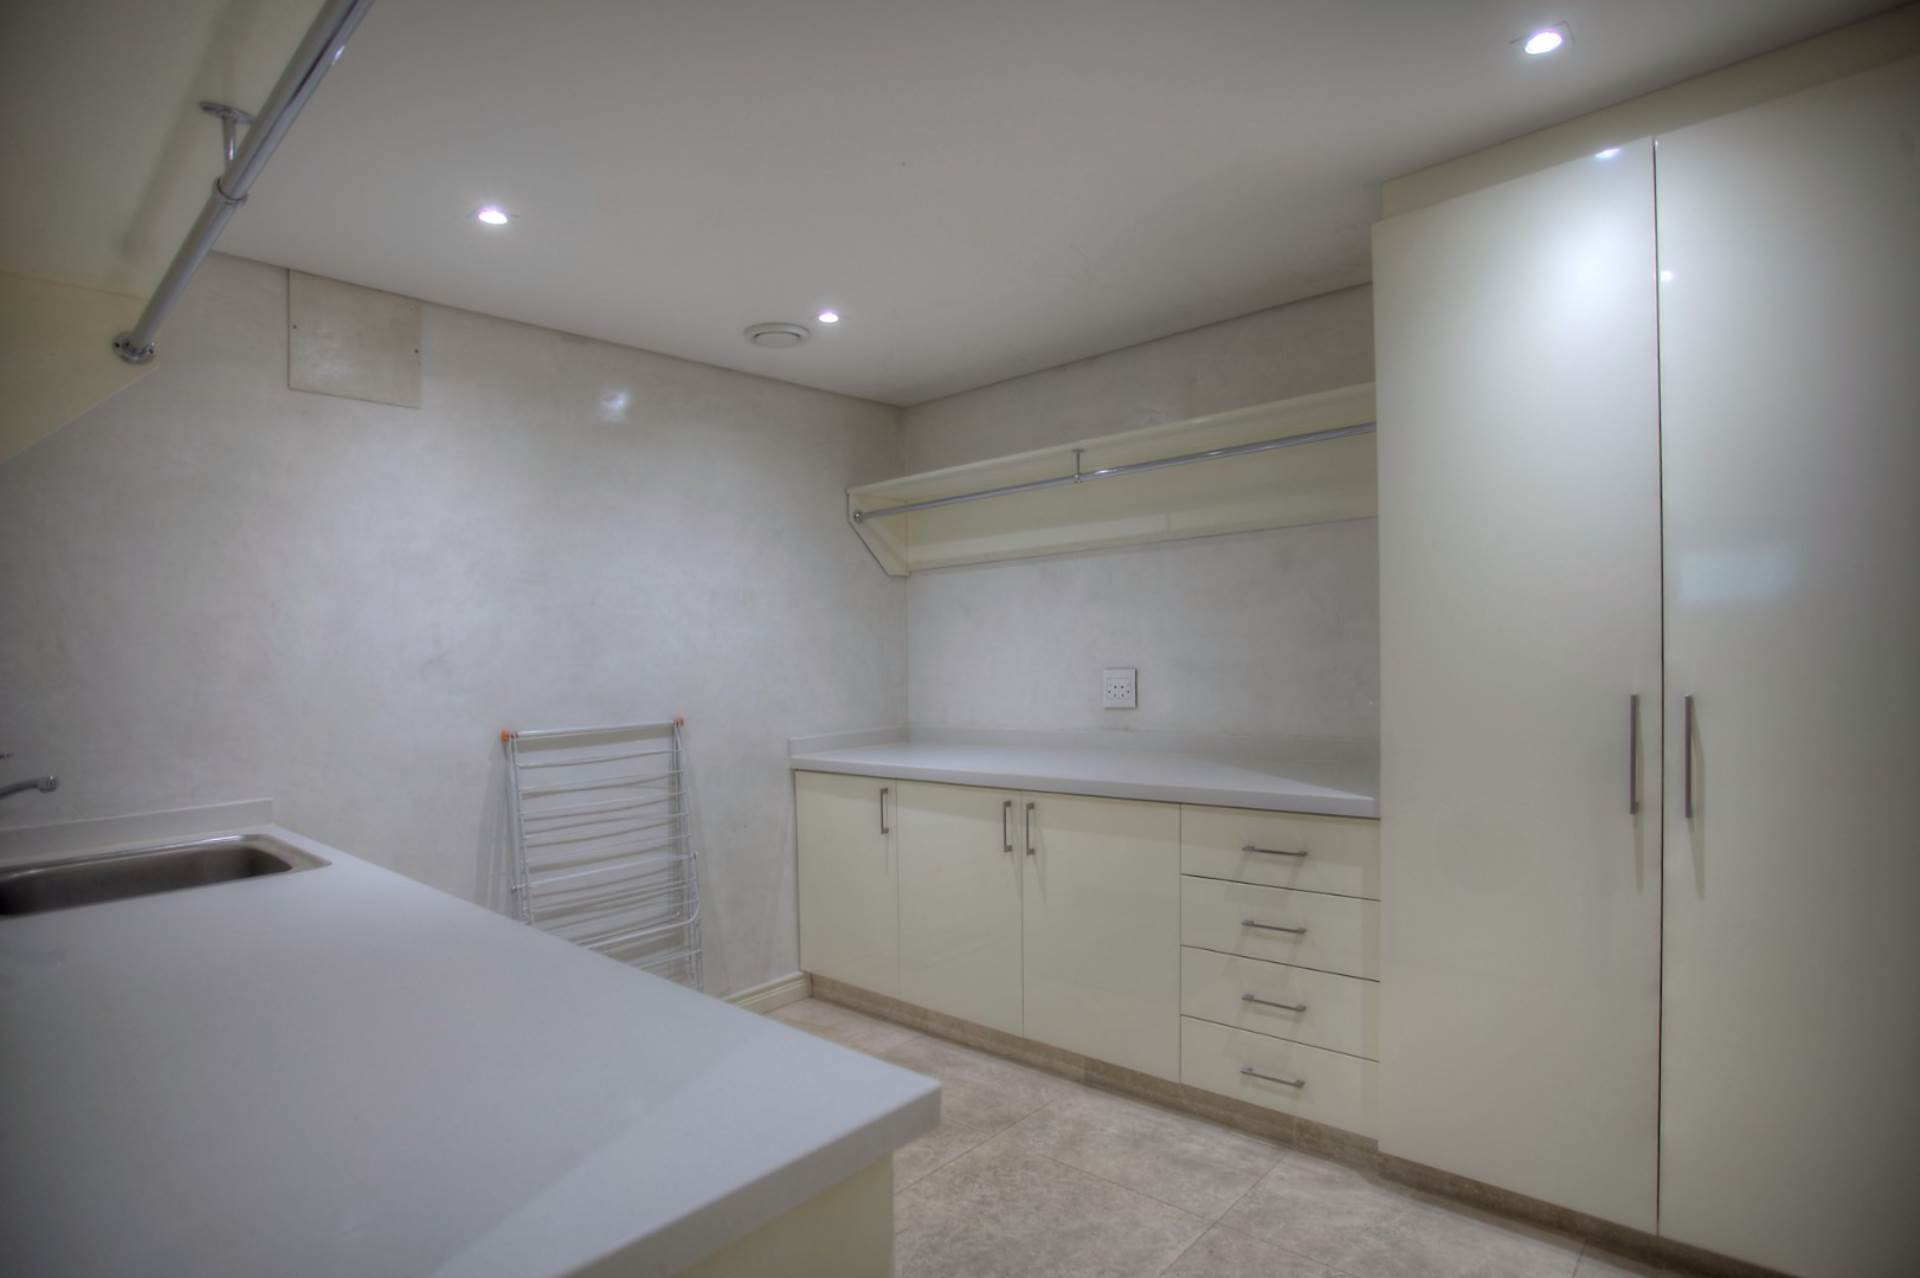 De Waterkant property for sale. Ref No: 13533994. Picture no 33